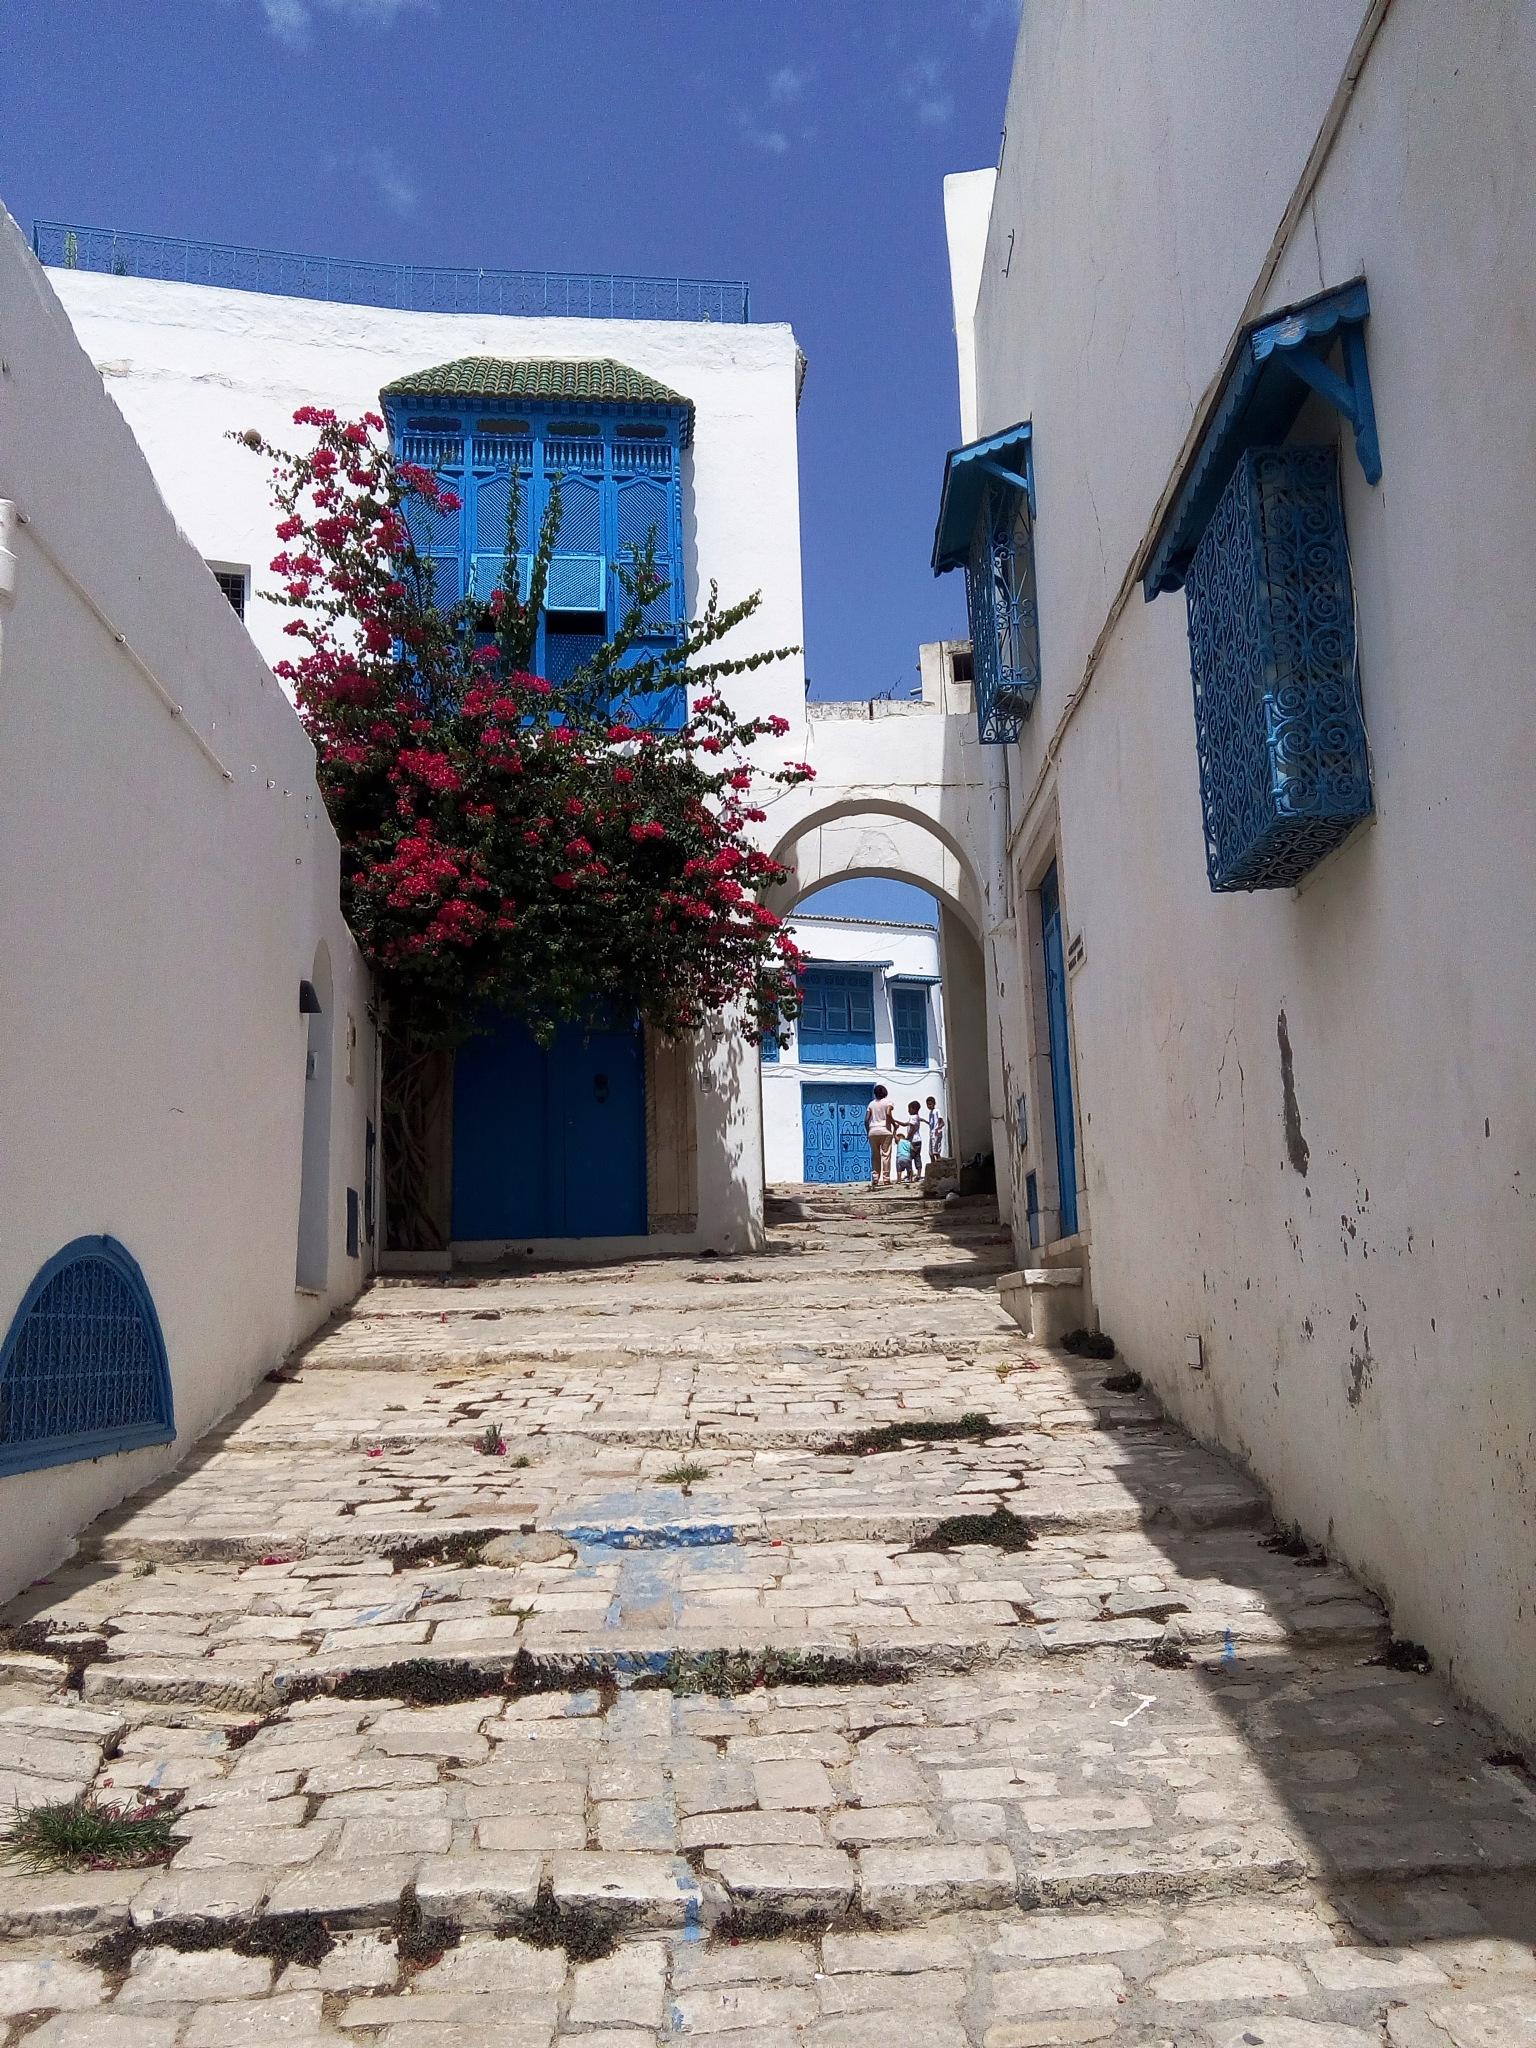 The Balcony Of The Mediterranean by Nedim ✅